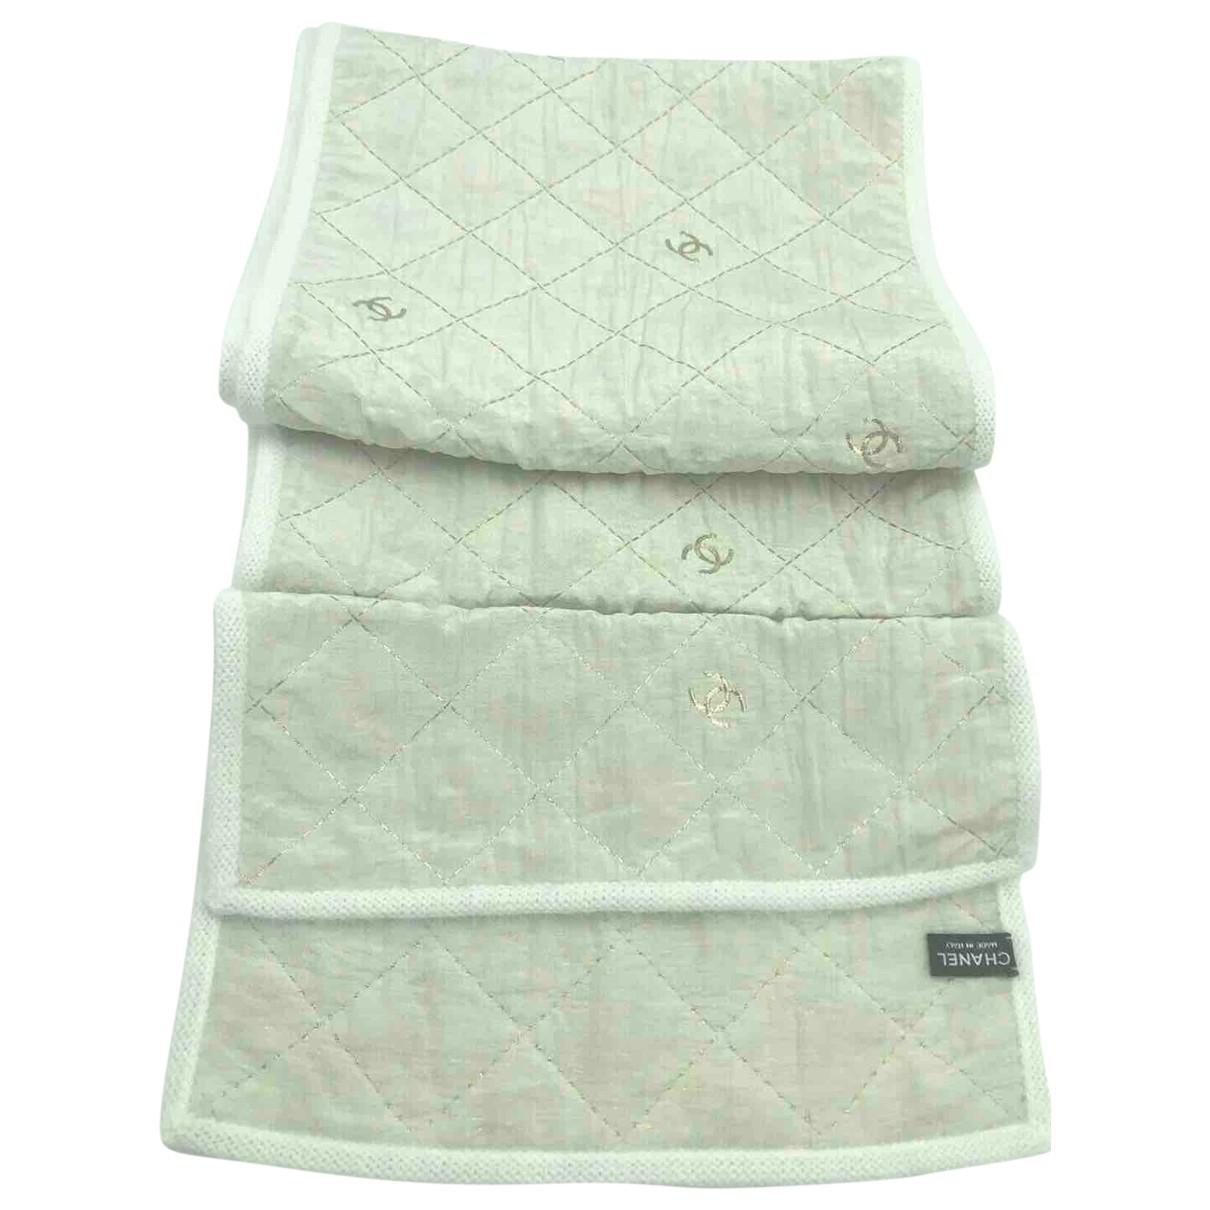 Chanel \N White Wool scarf for Women \N